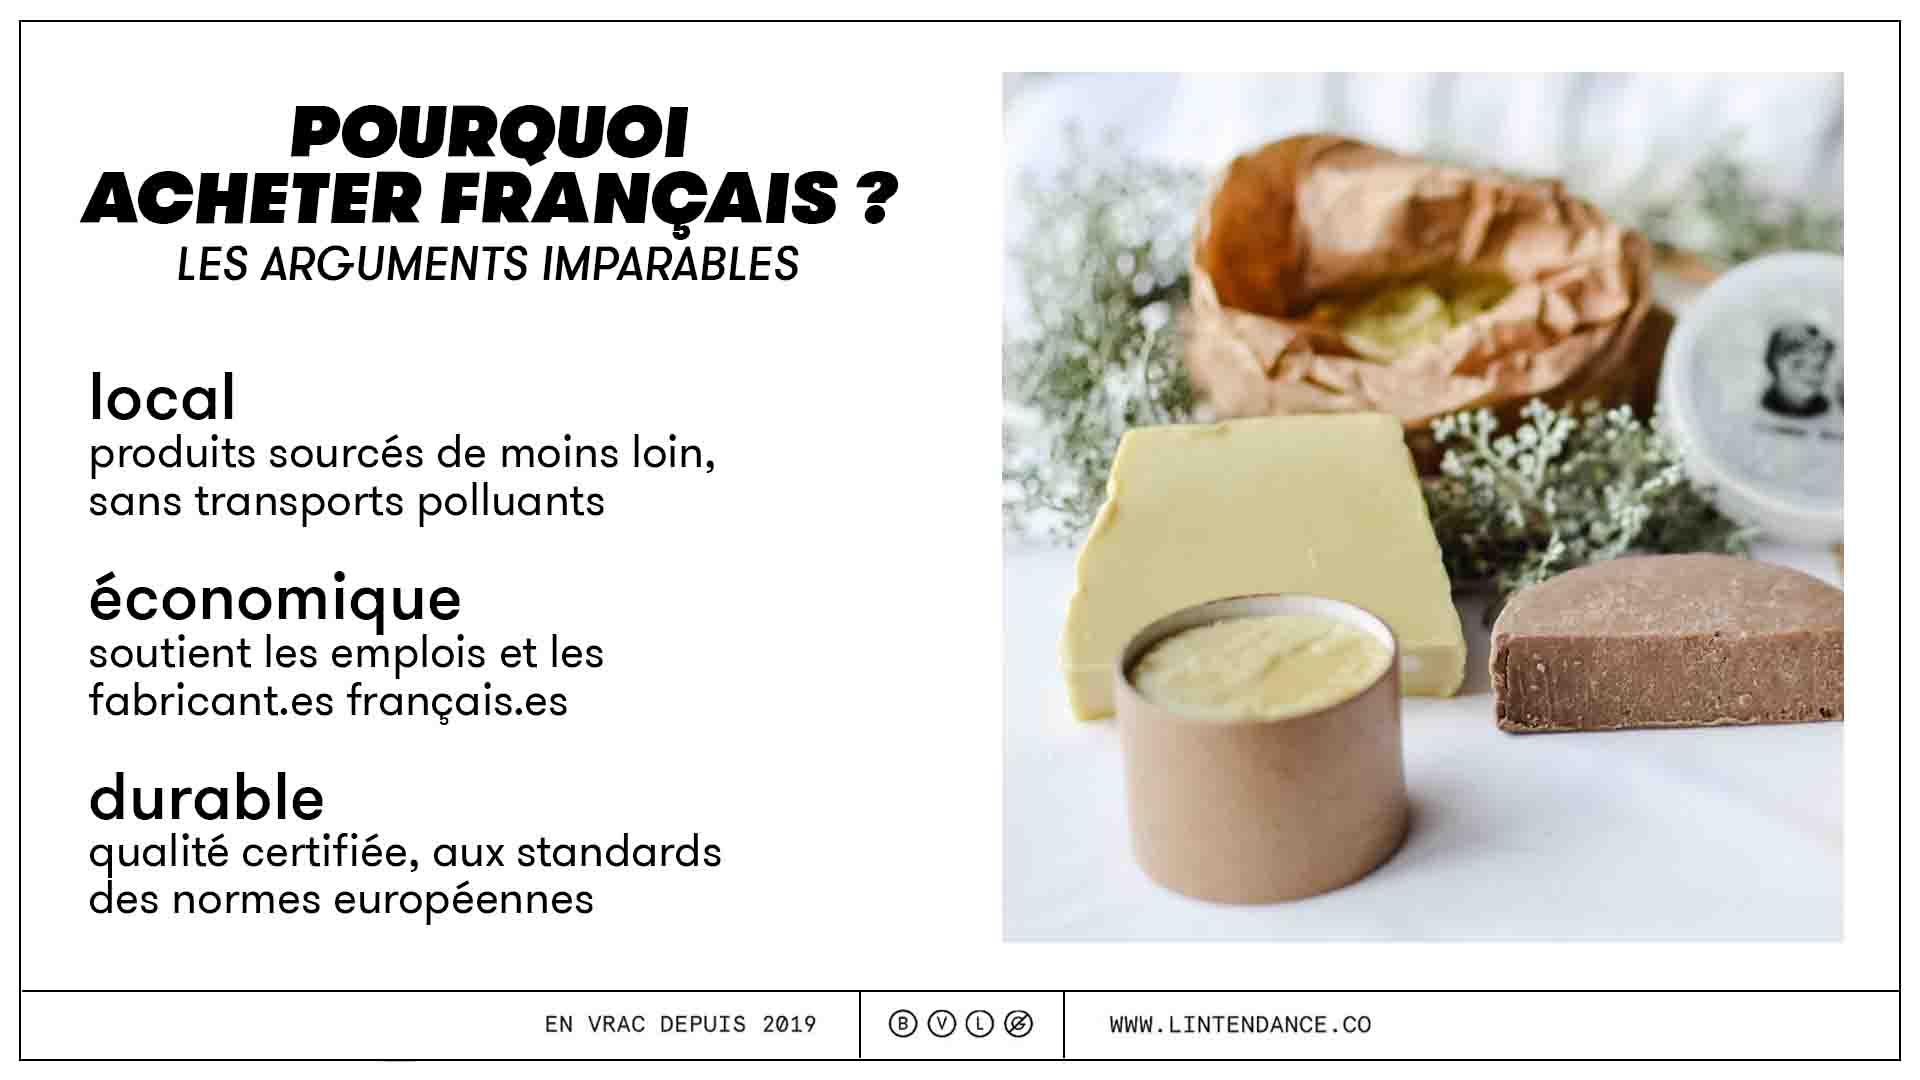 pourquoi acheter français produits made in france